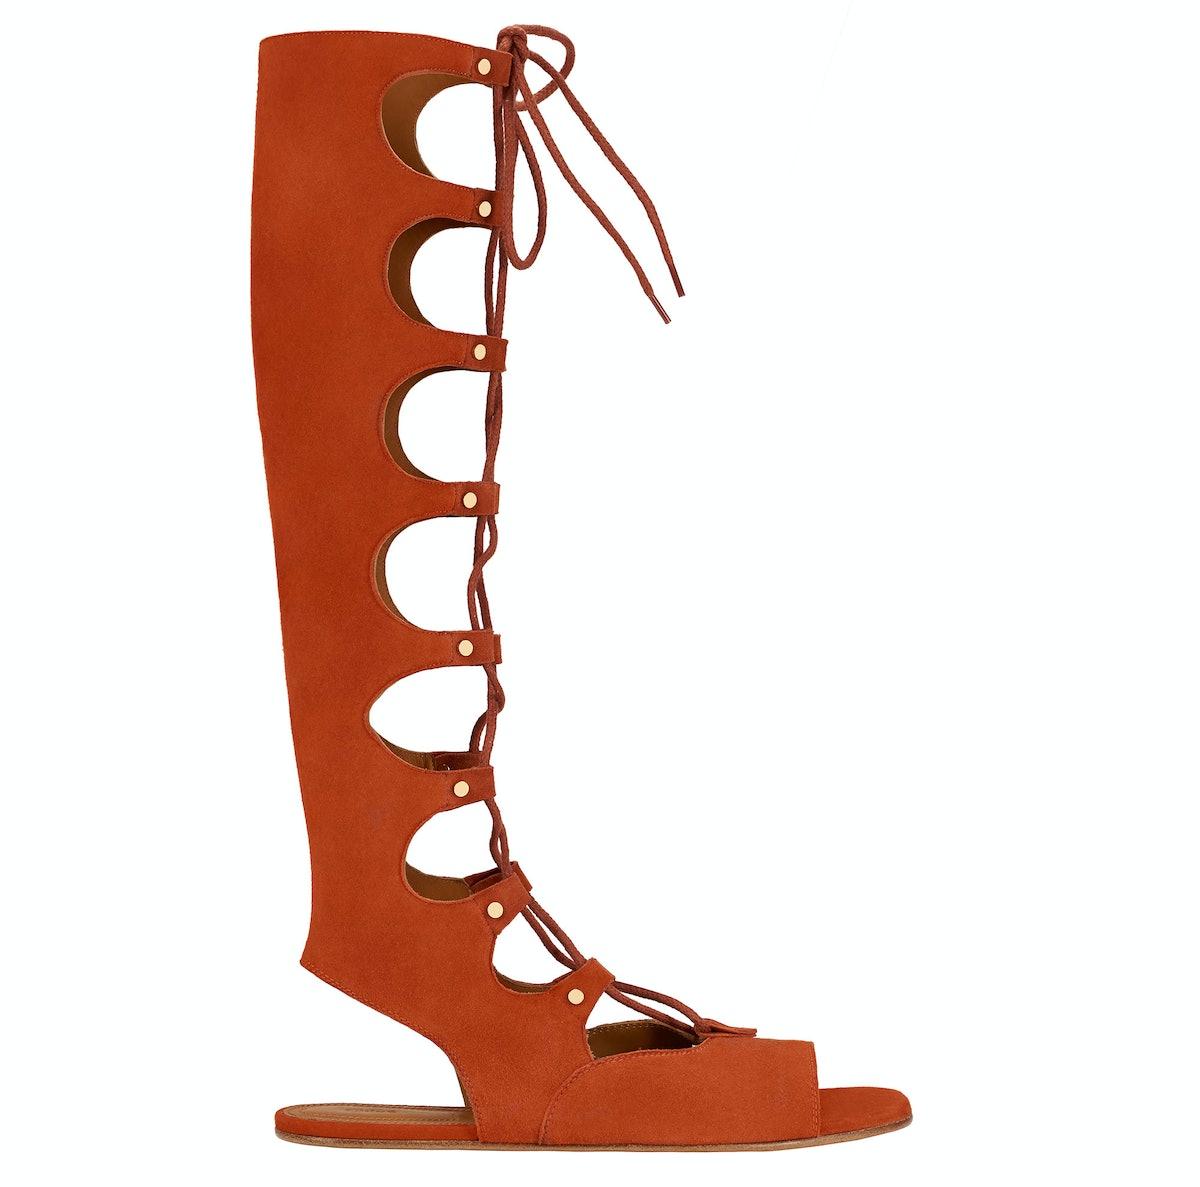 Chloe gladiator sandals